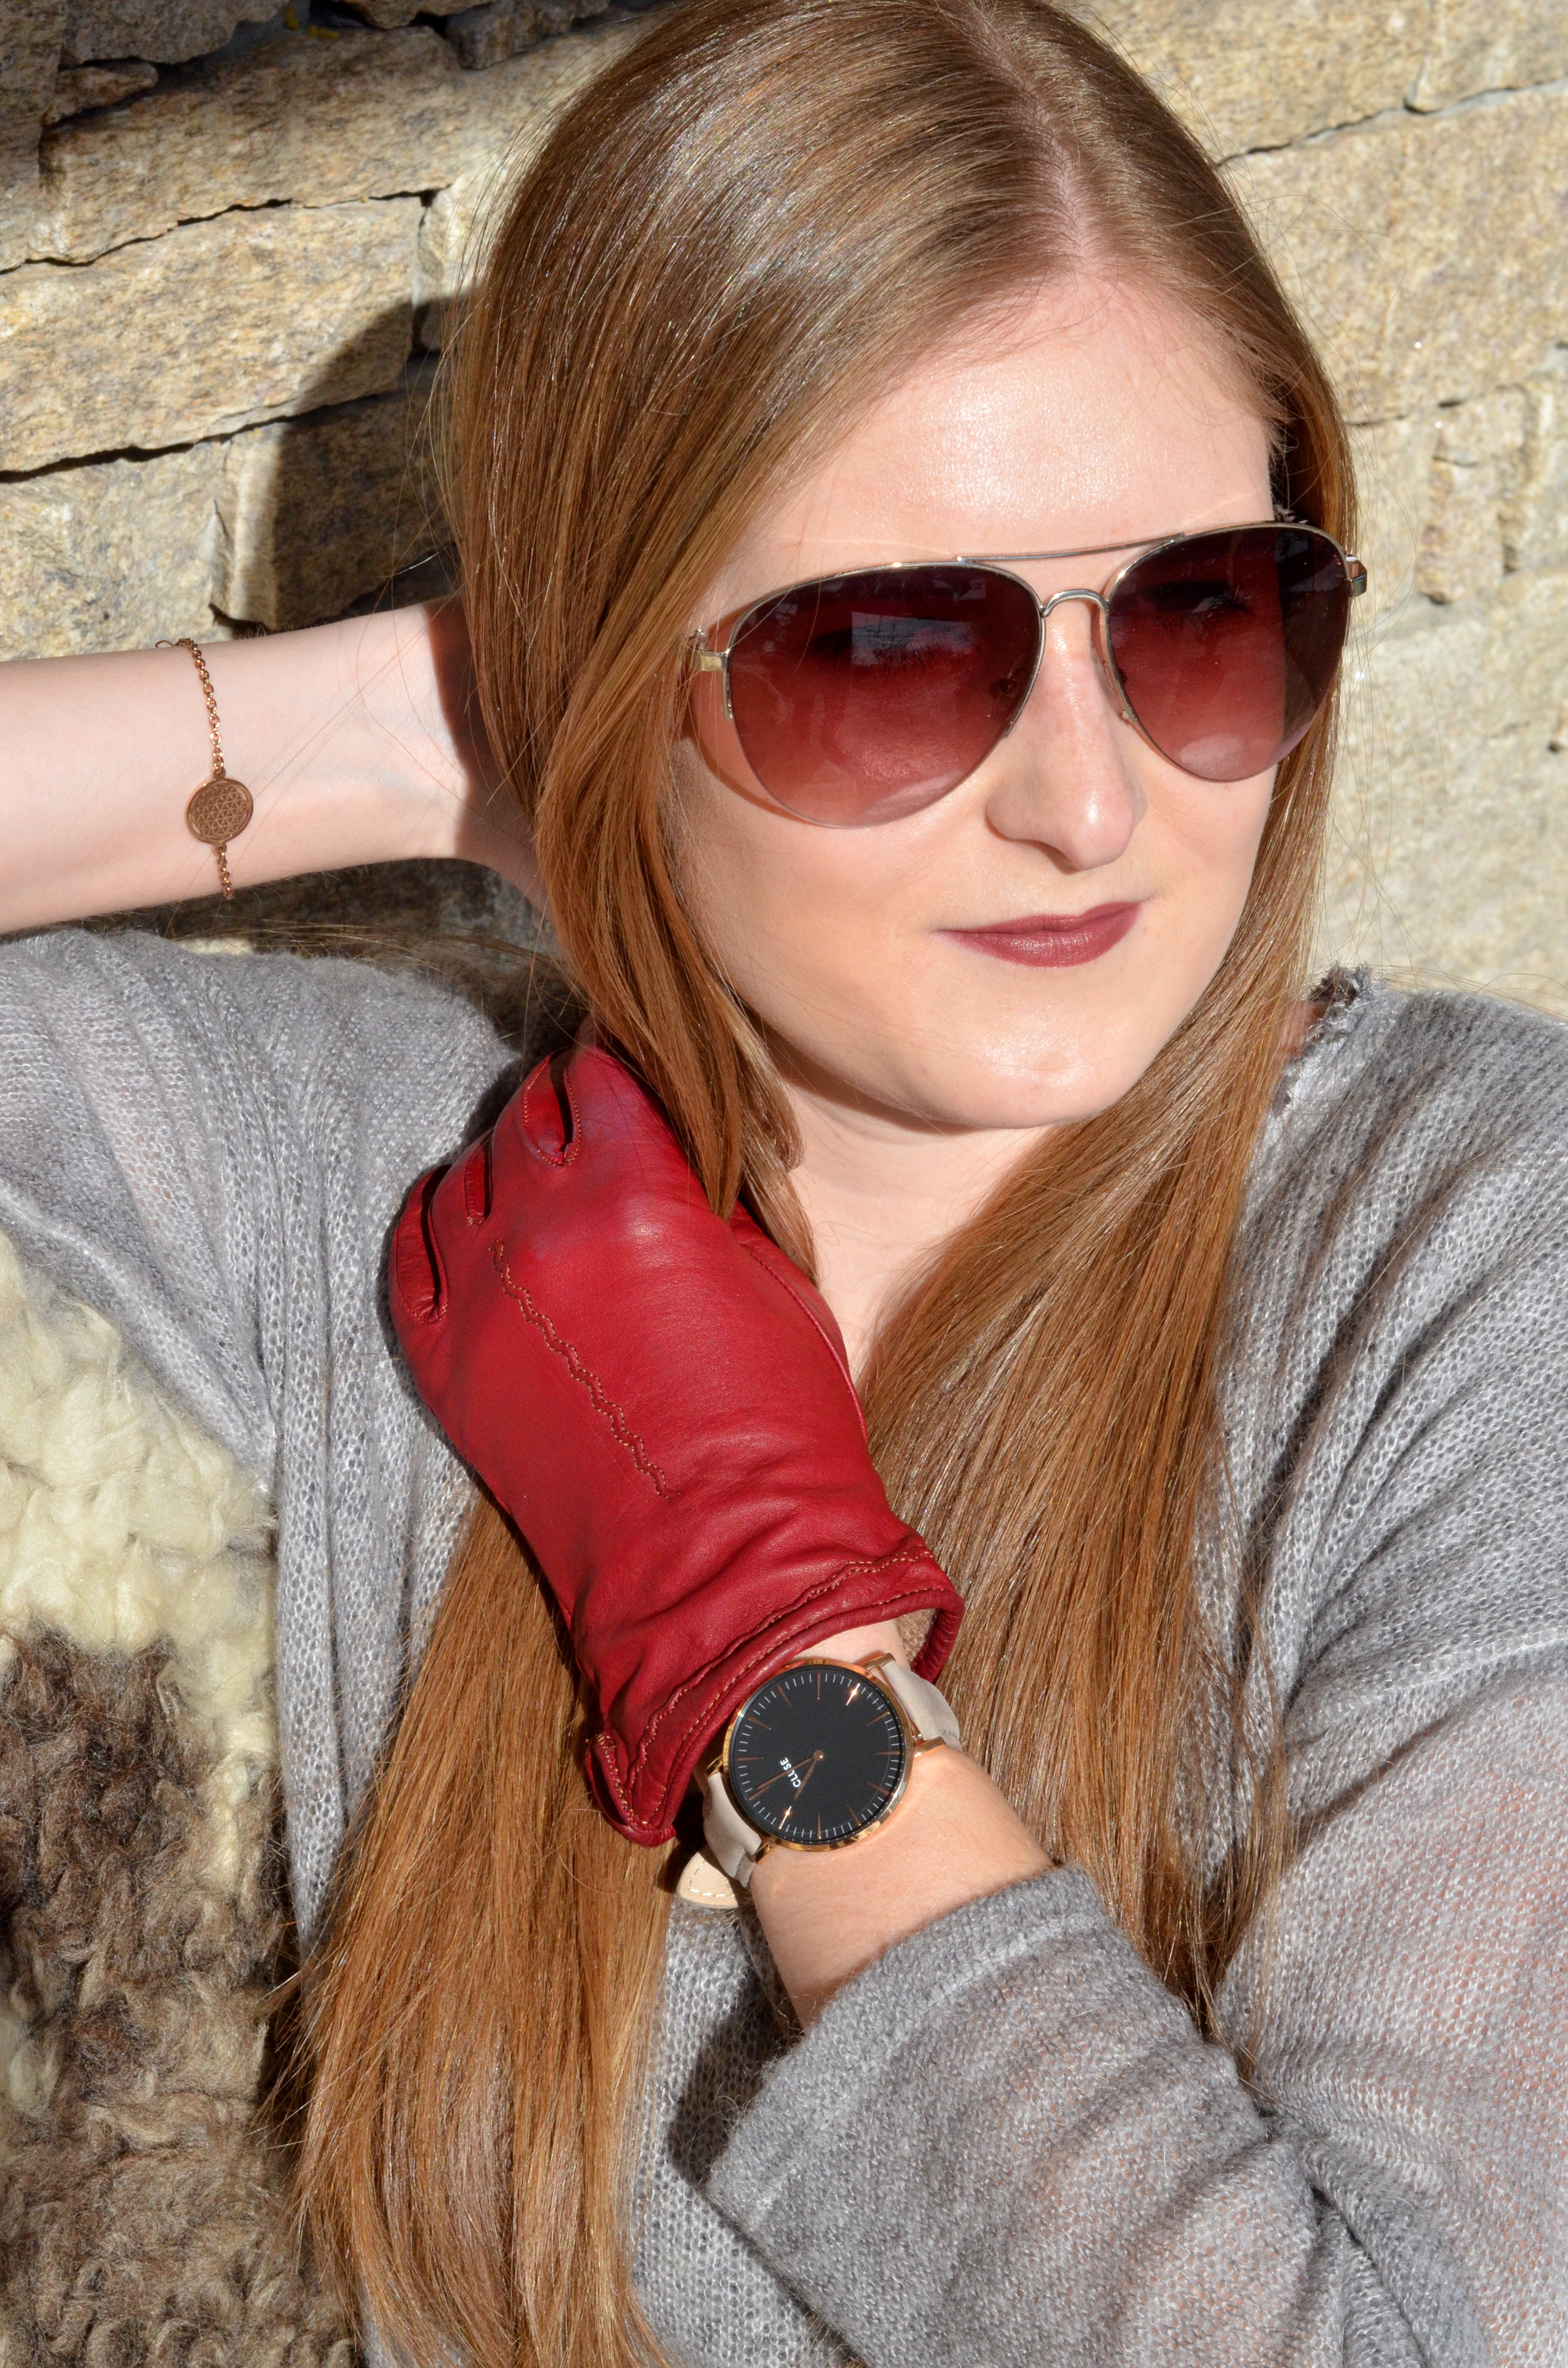 Winteroutfit - Strickkleid & rote Lederhandschuhe